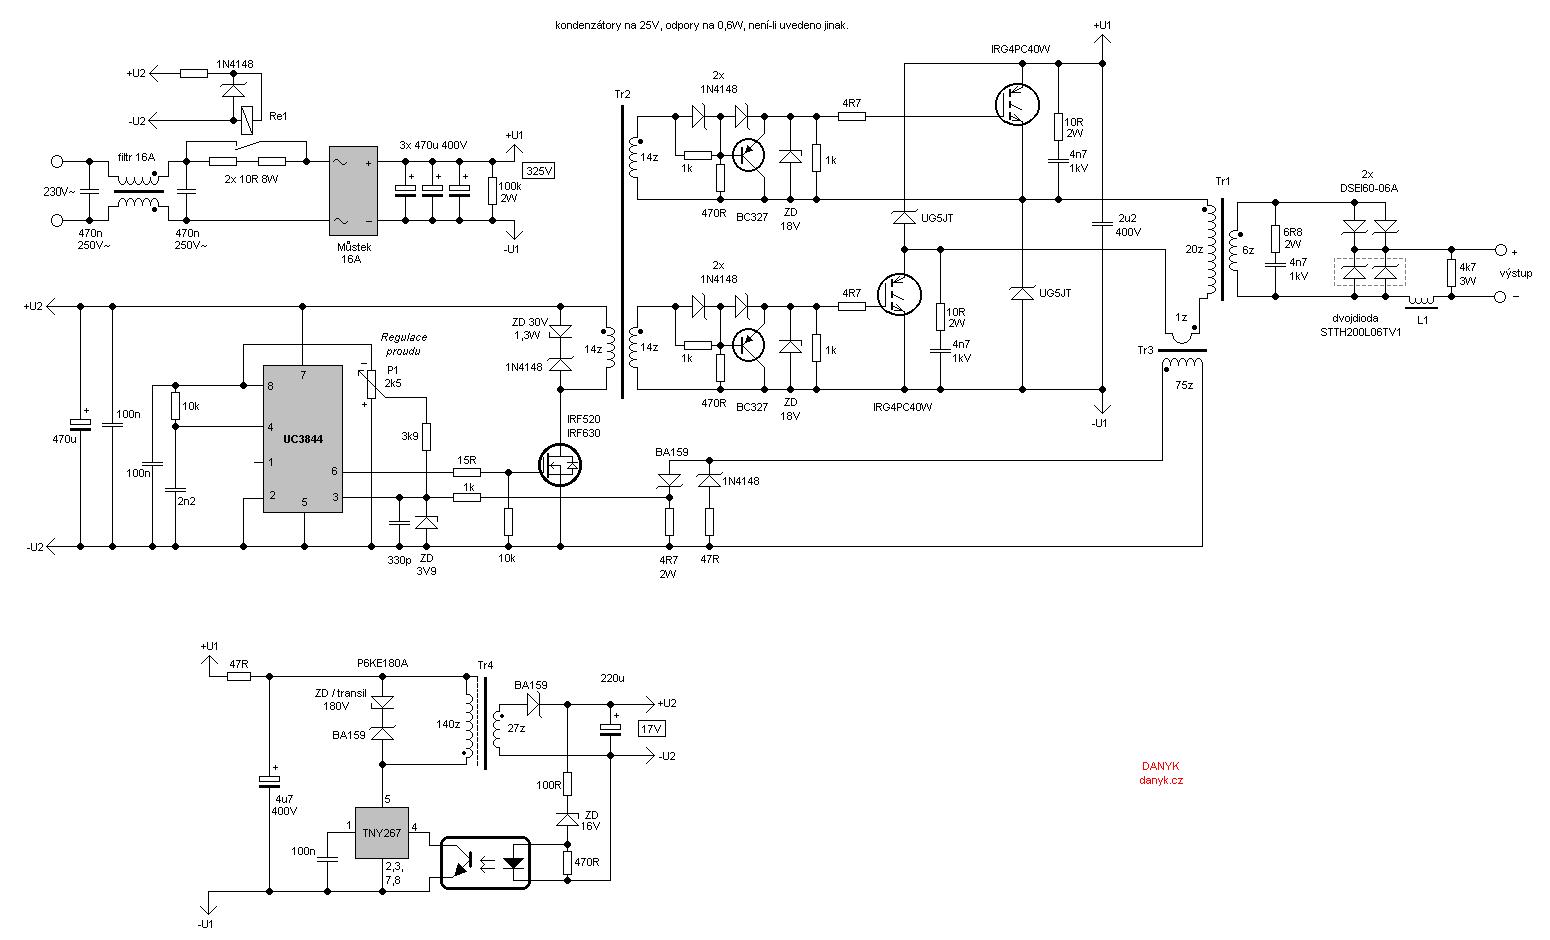 Pin De Benny Triharyadi Em Metalwork Eletronica Eletronicos